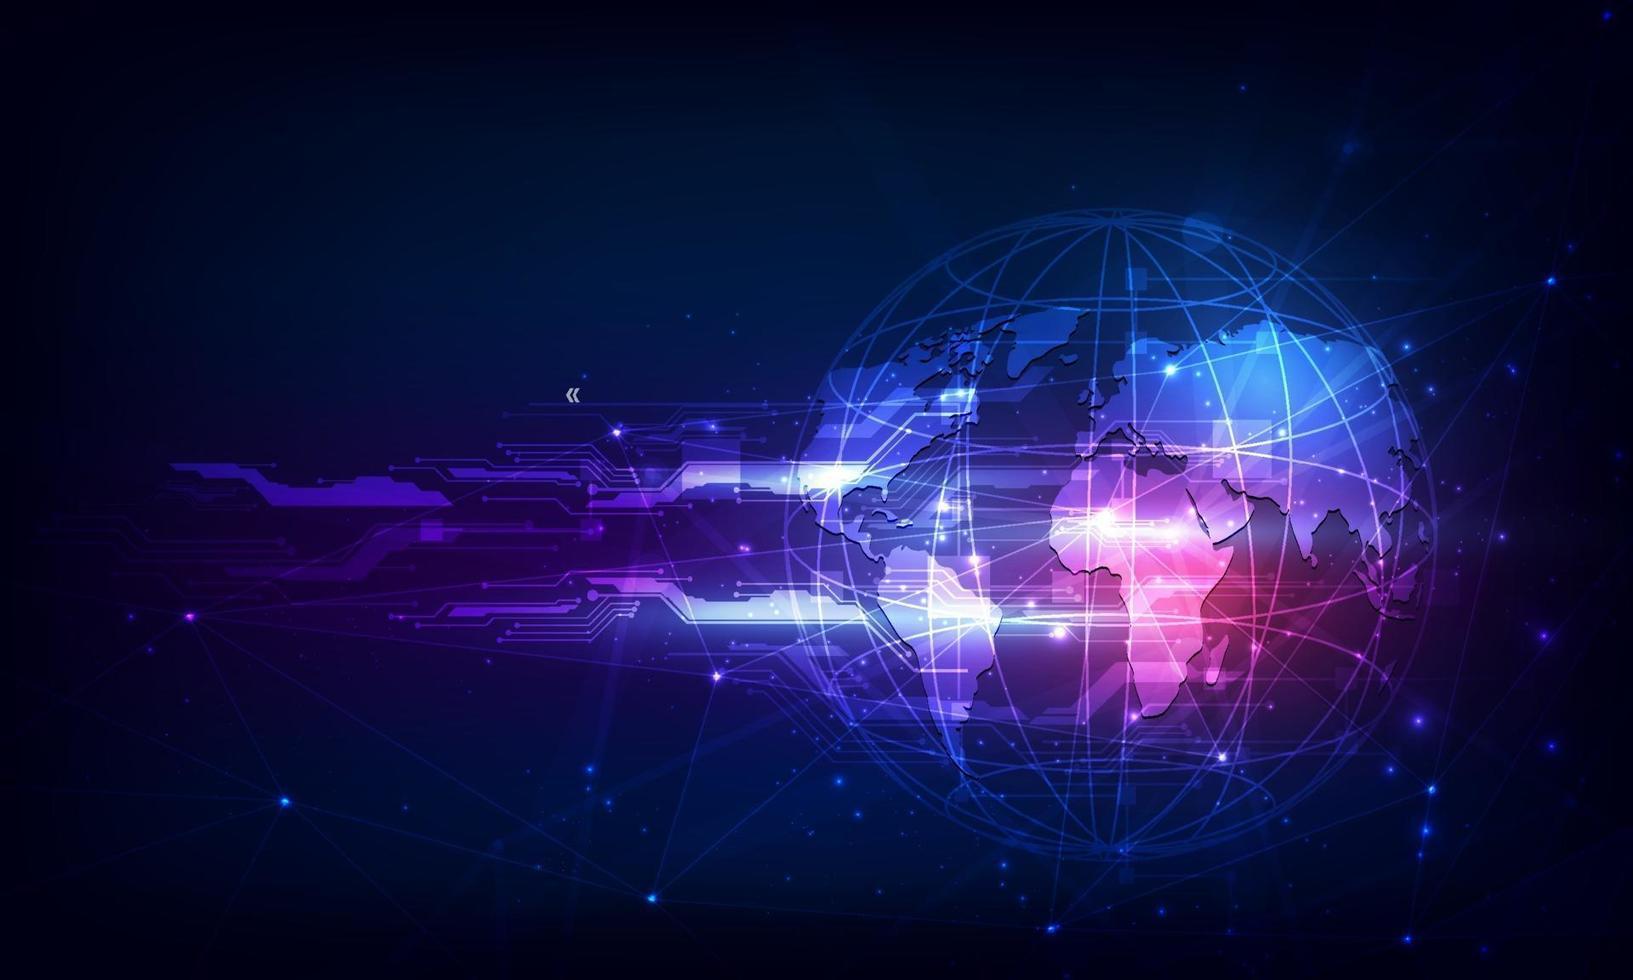 abstract tech bol digitaal circuit patroon innoveren concept b vector